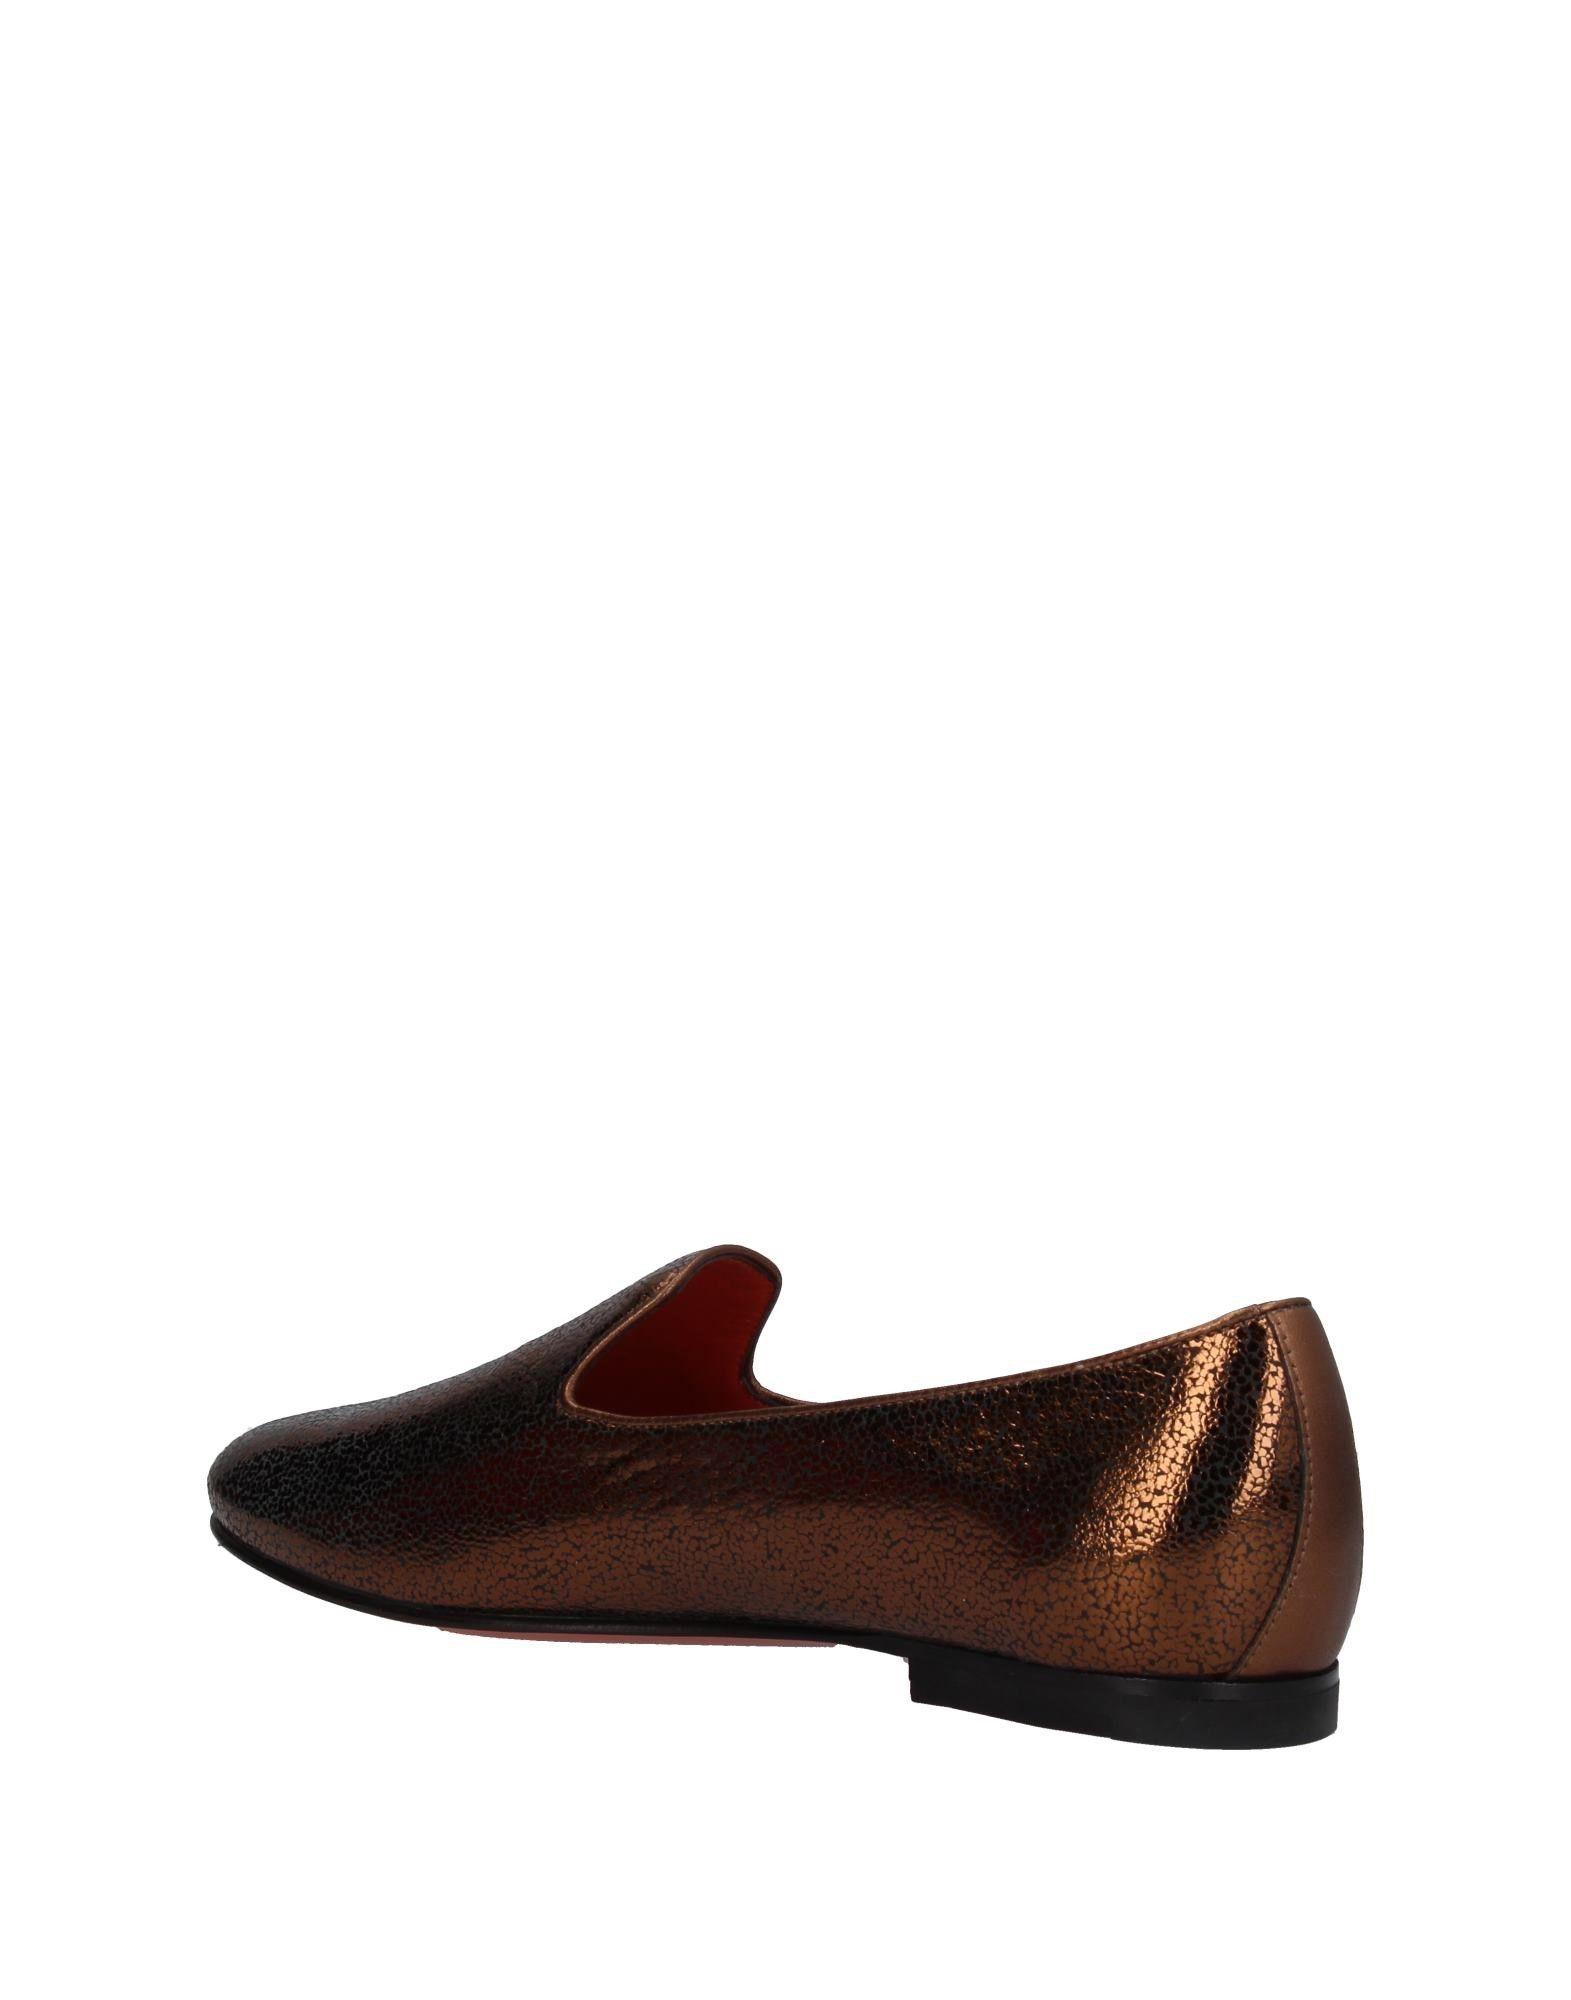 Stilvolle Santoni billige Schuhe Santoni Stilvolle Mokassins Damen  11388086OM 5b614b